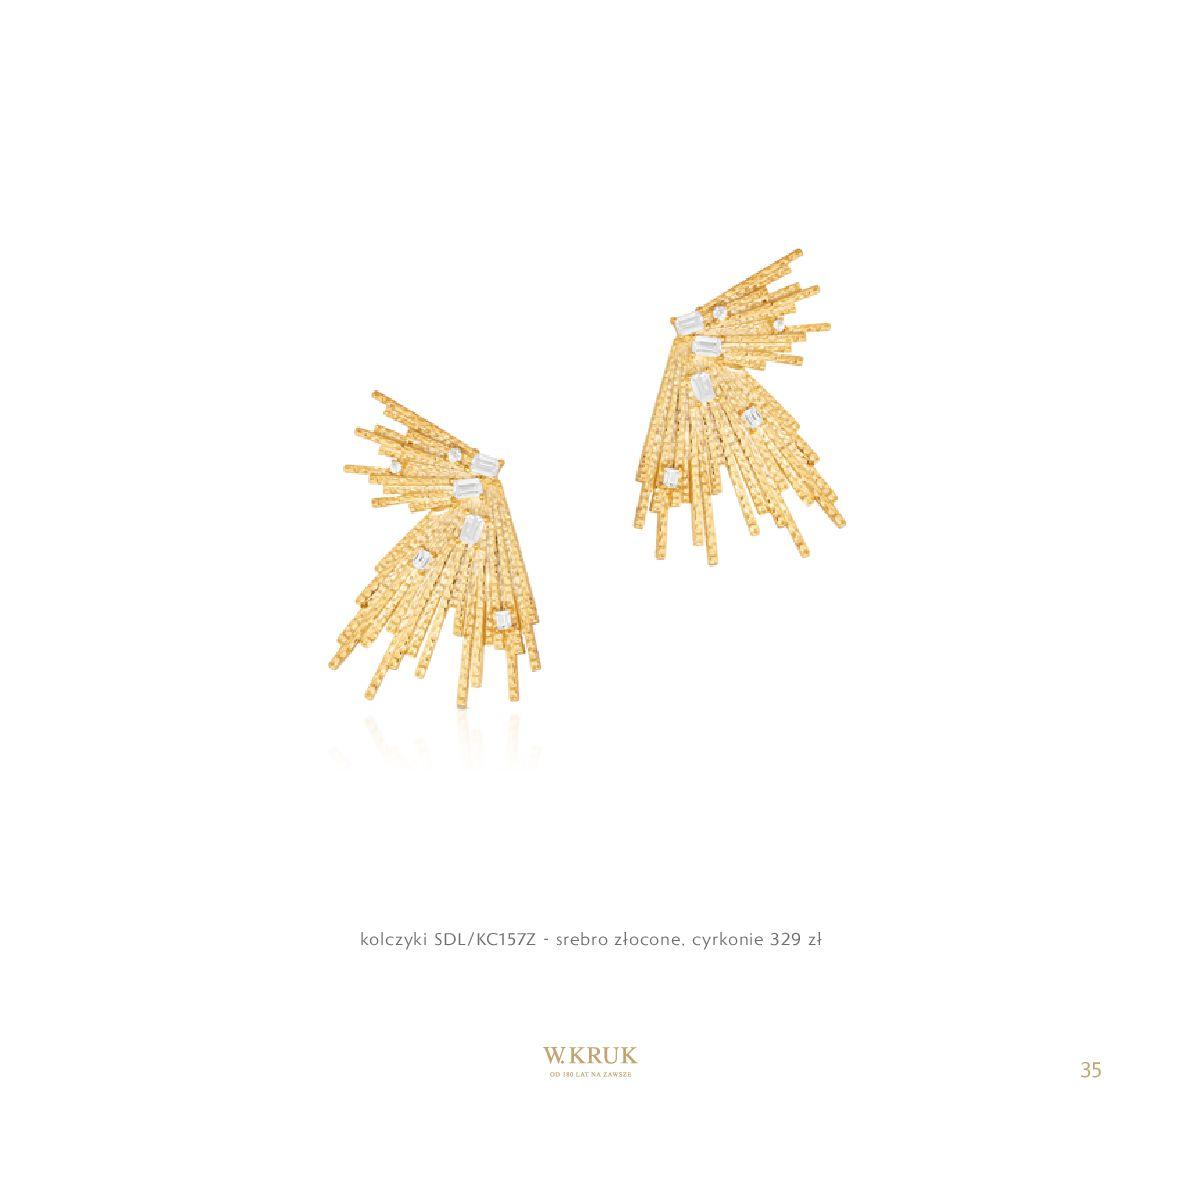 Gazetka W. KRUK: Katalog - Kolekcja Blask 2021-02-17 page-36